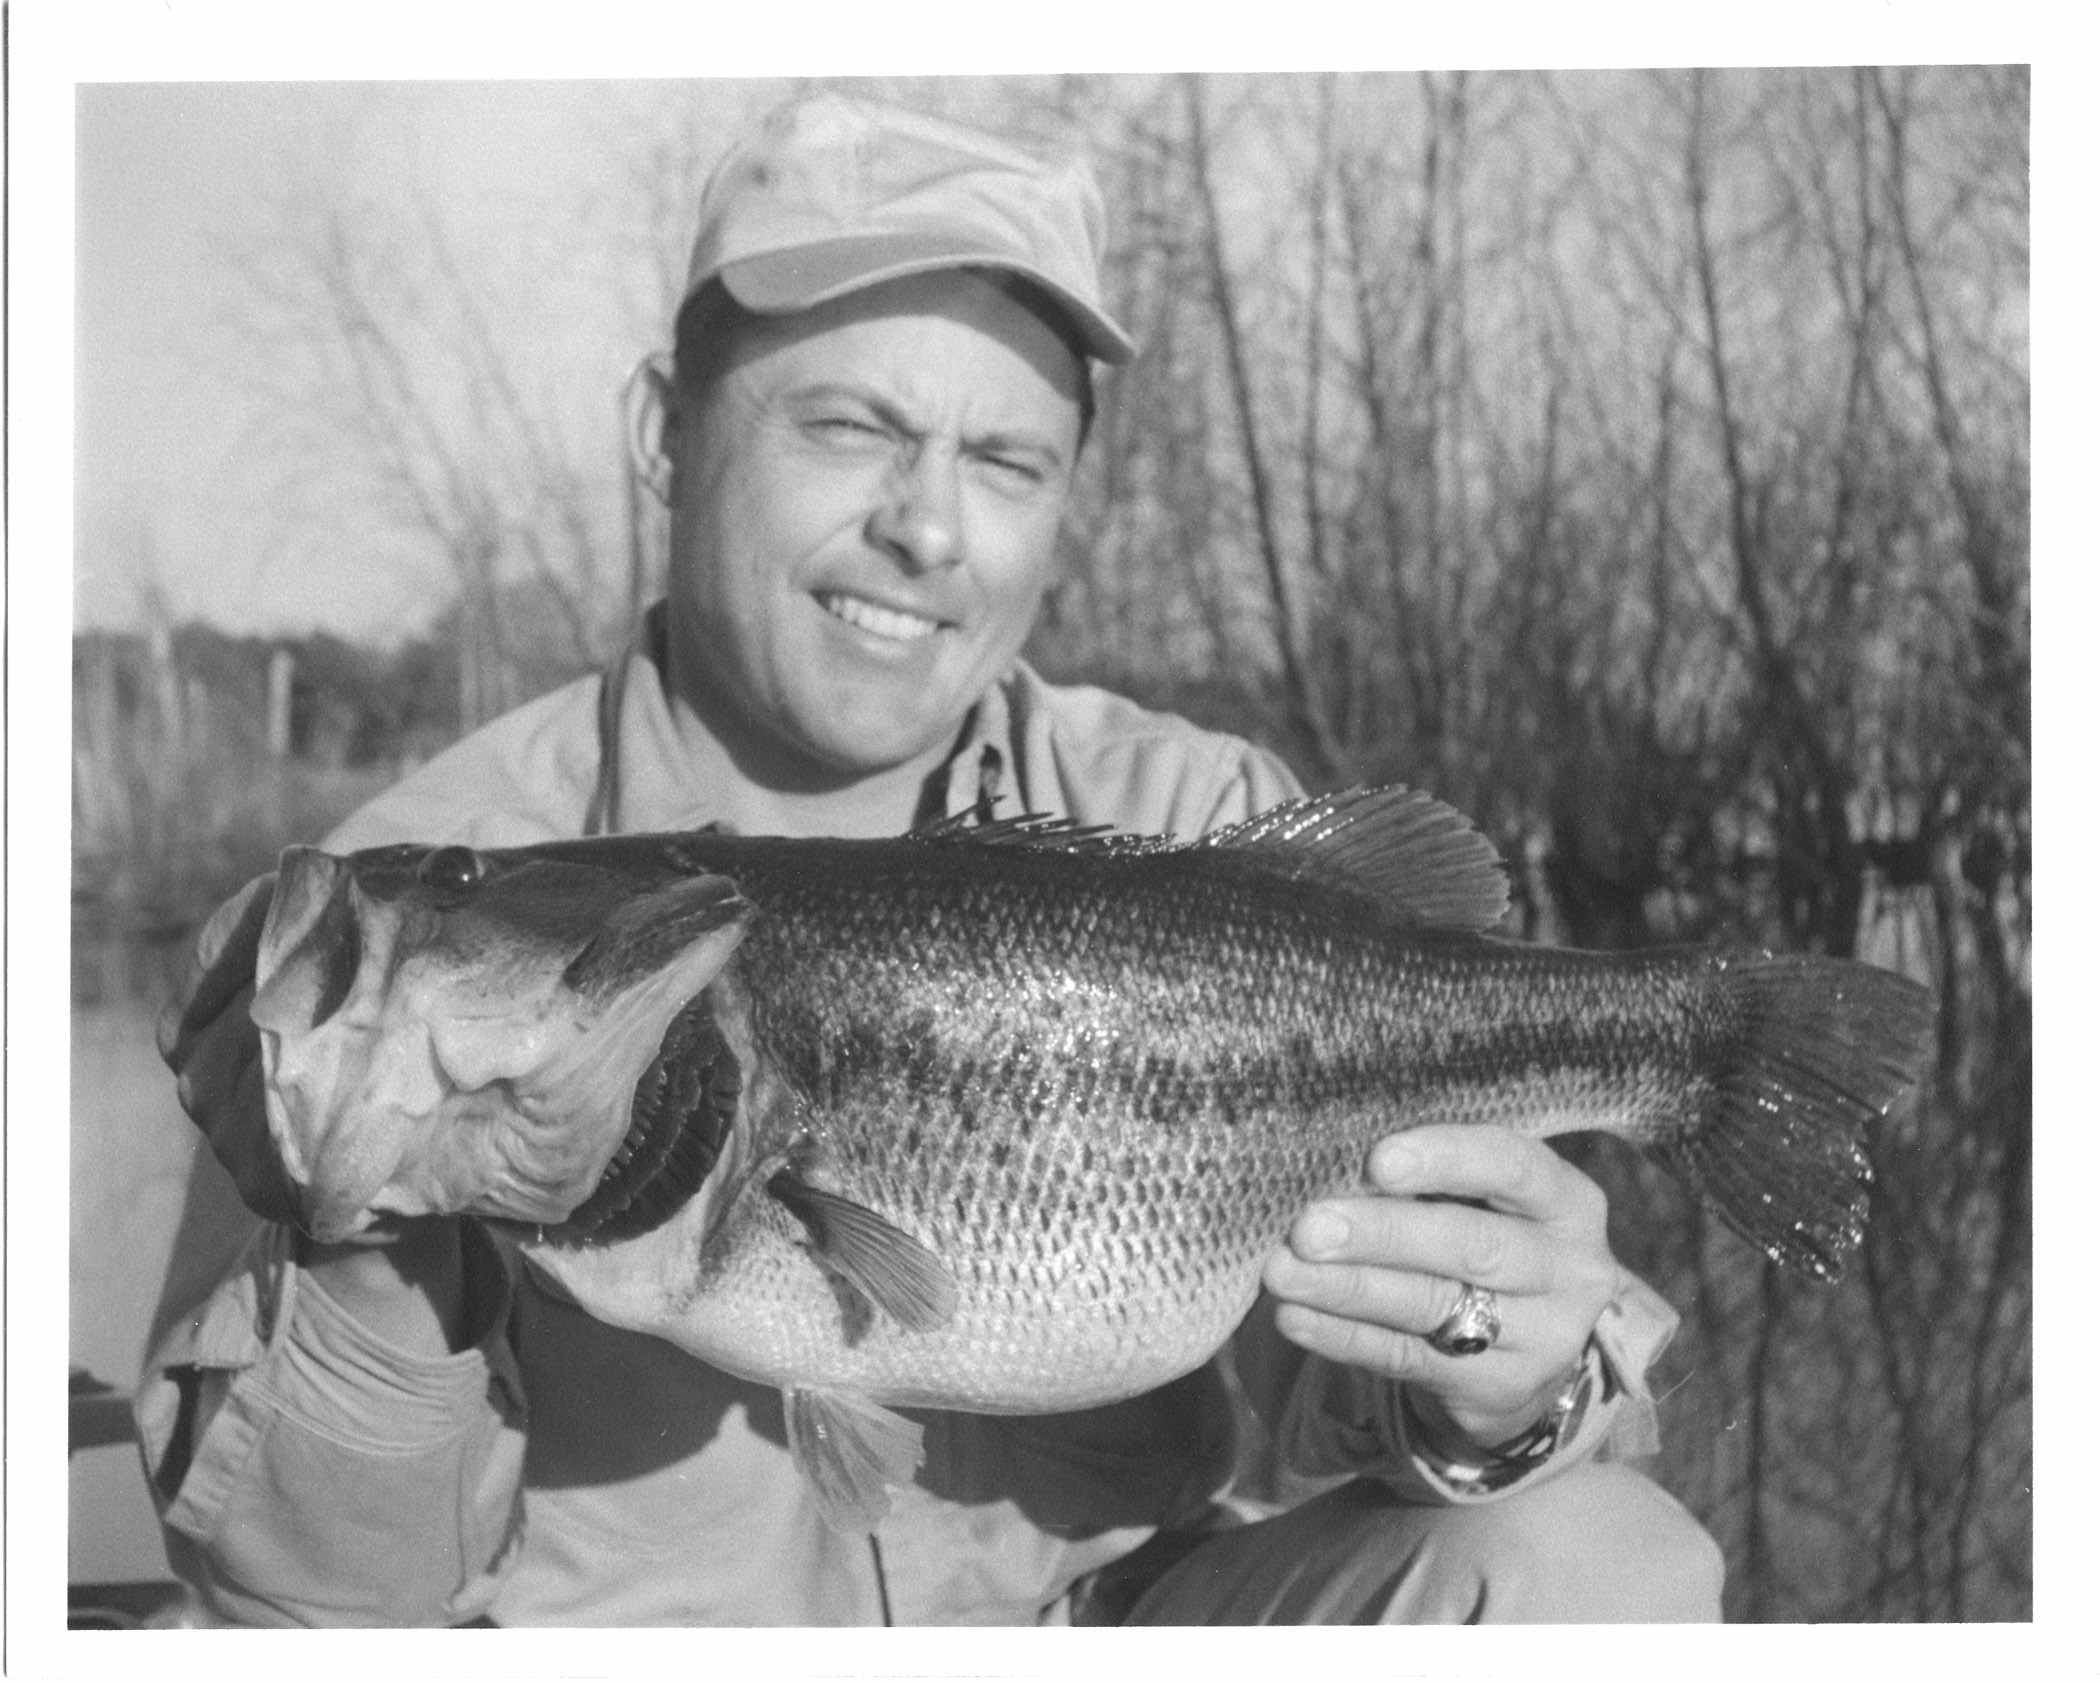 Freshwater Fishing Hall of Fame inductee, Buddy Bradley, photo © Buddy Bradley